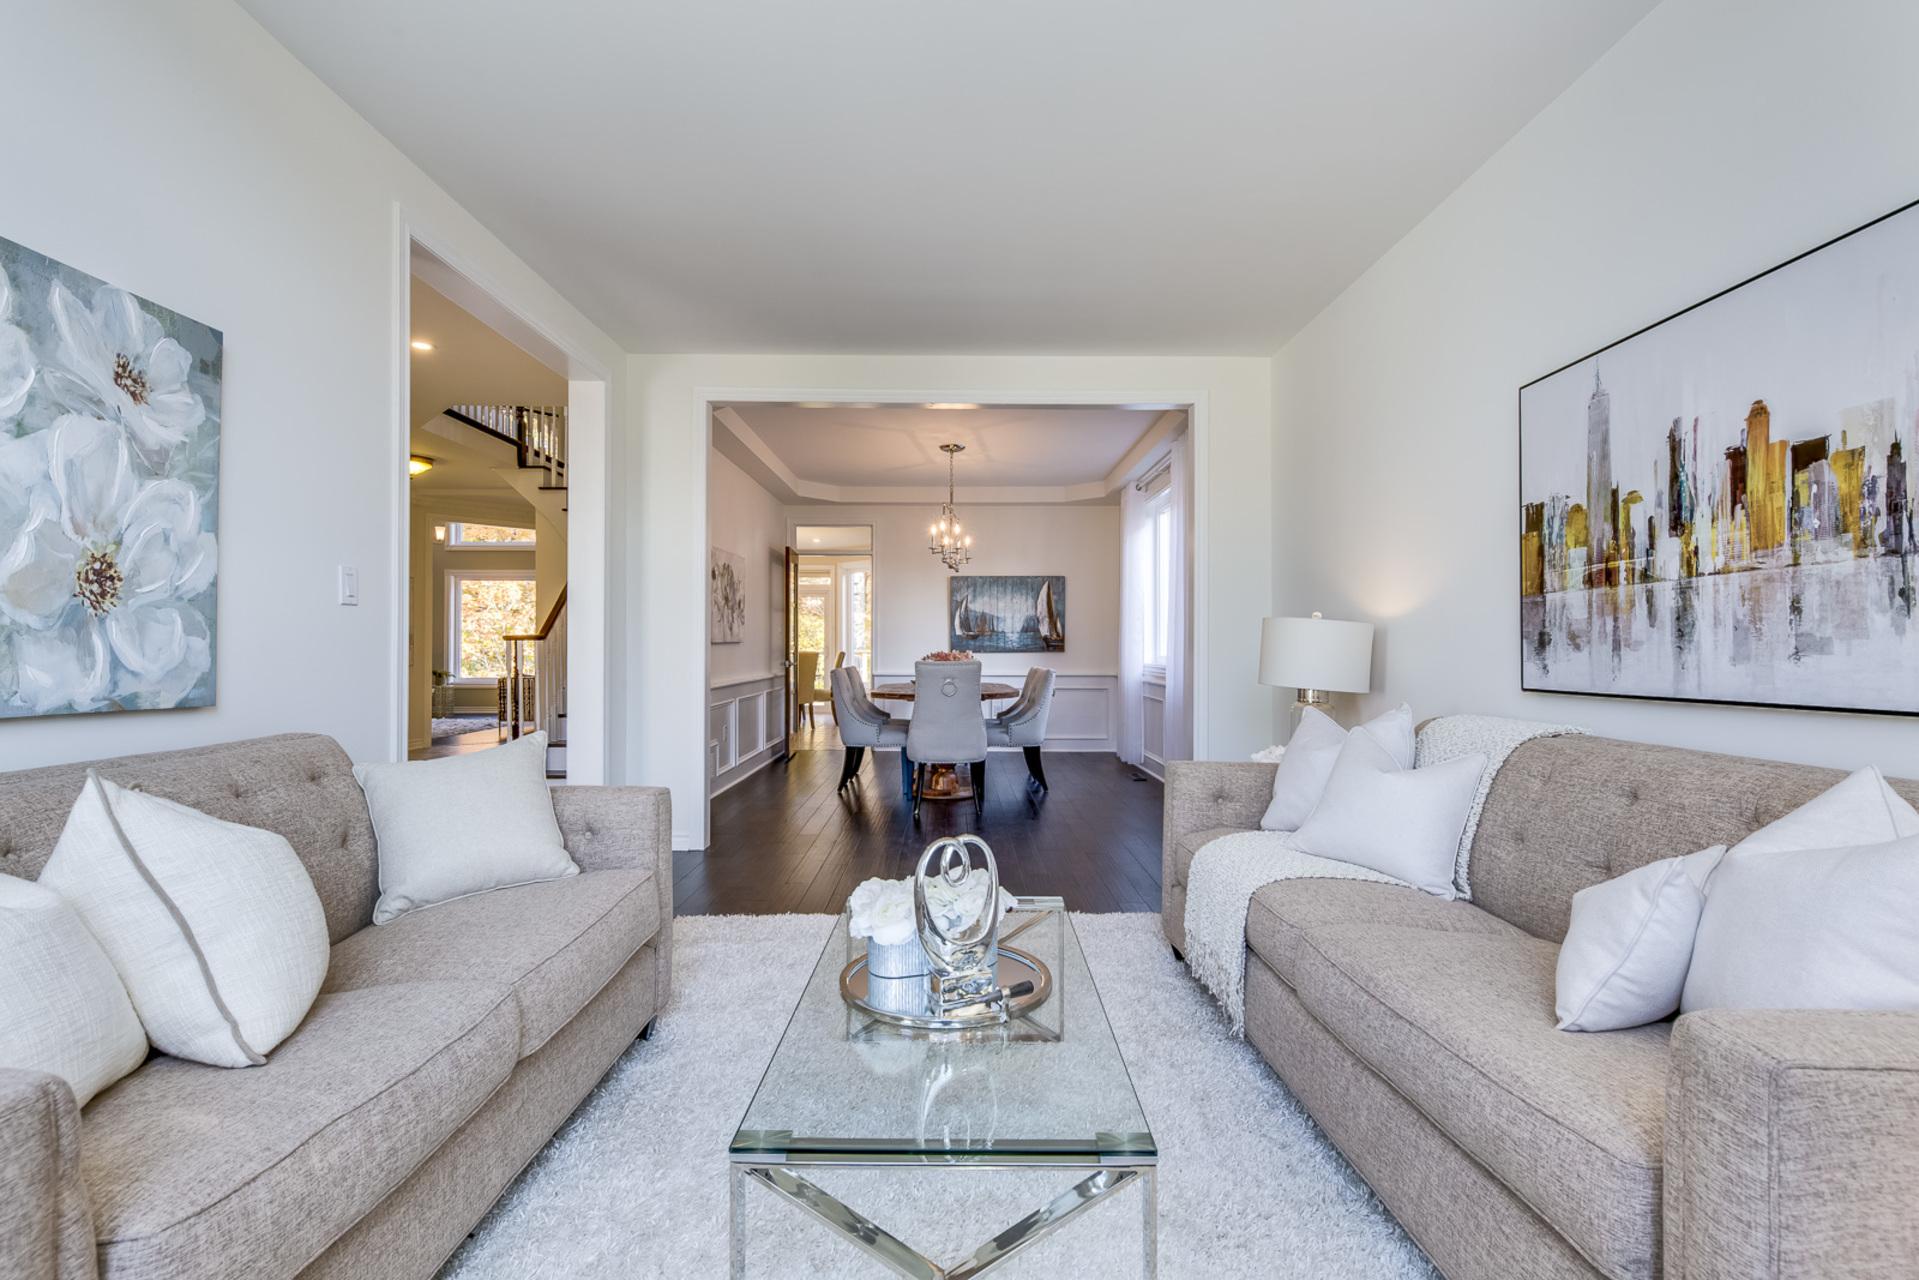 Living Room - 1806 Glenvista Dr, Oakville - Elite3 & Team at 1806 Glenvista Drive, Iroquois Ridge North, Oakville